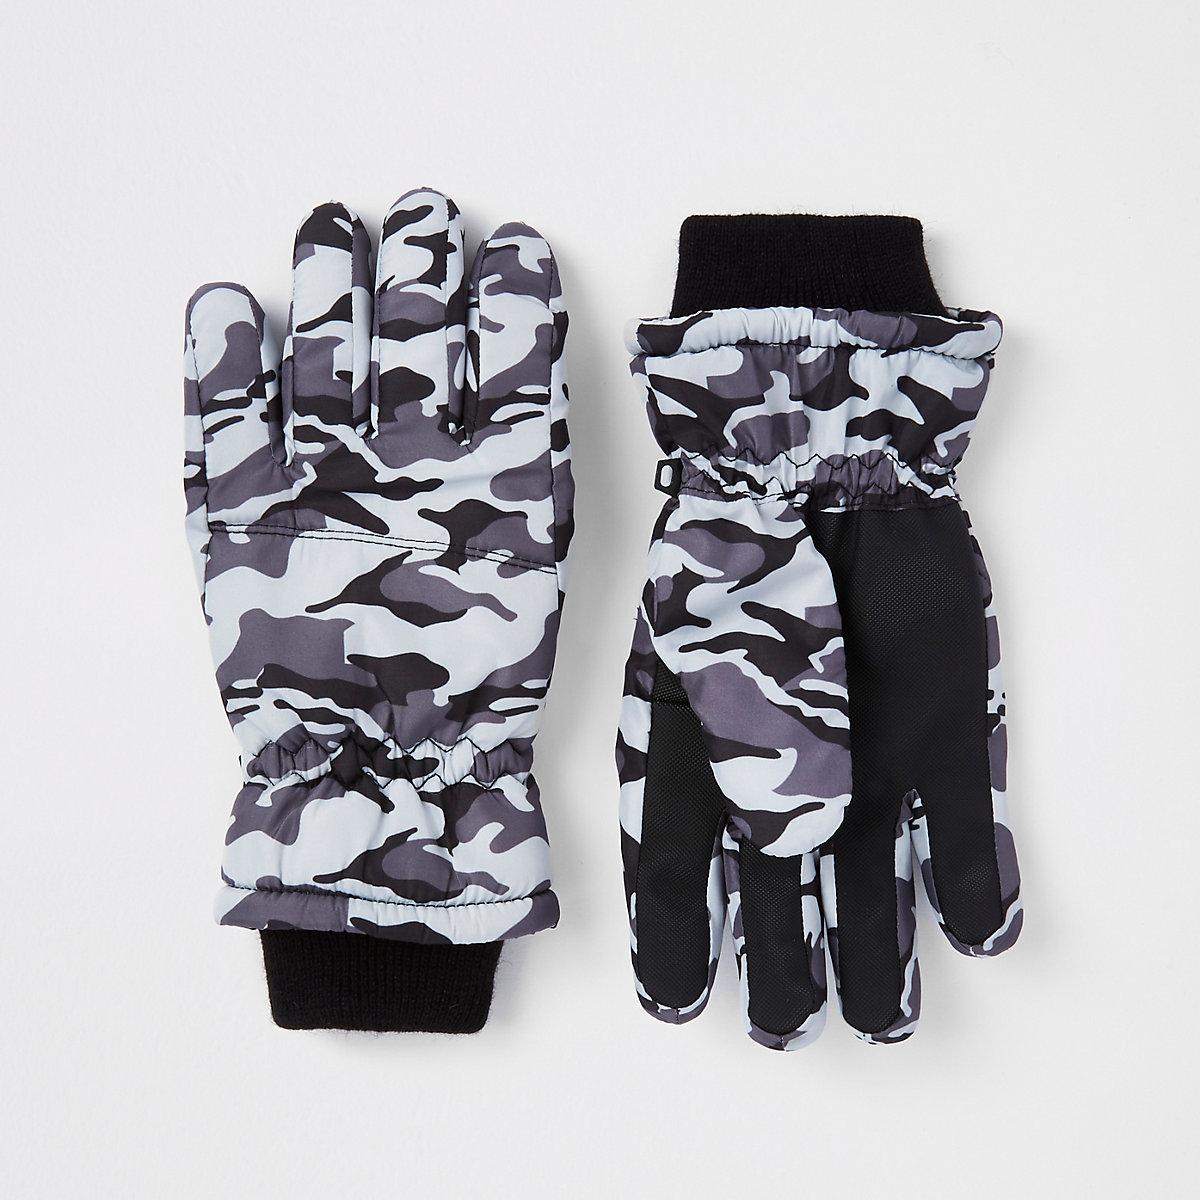 Graue Handschuhe mit Camouflage-Muster